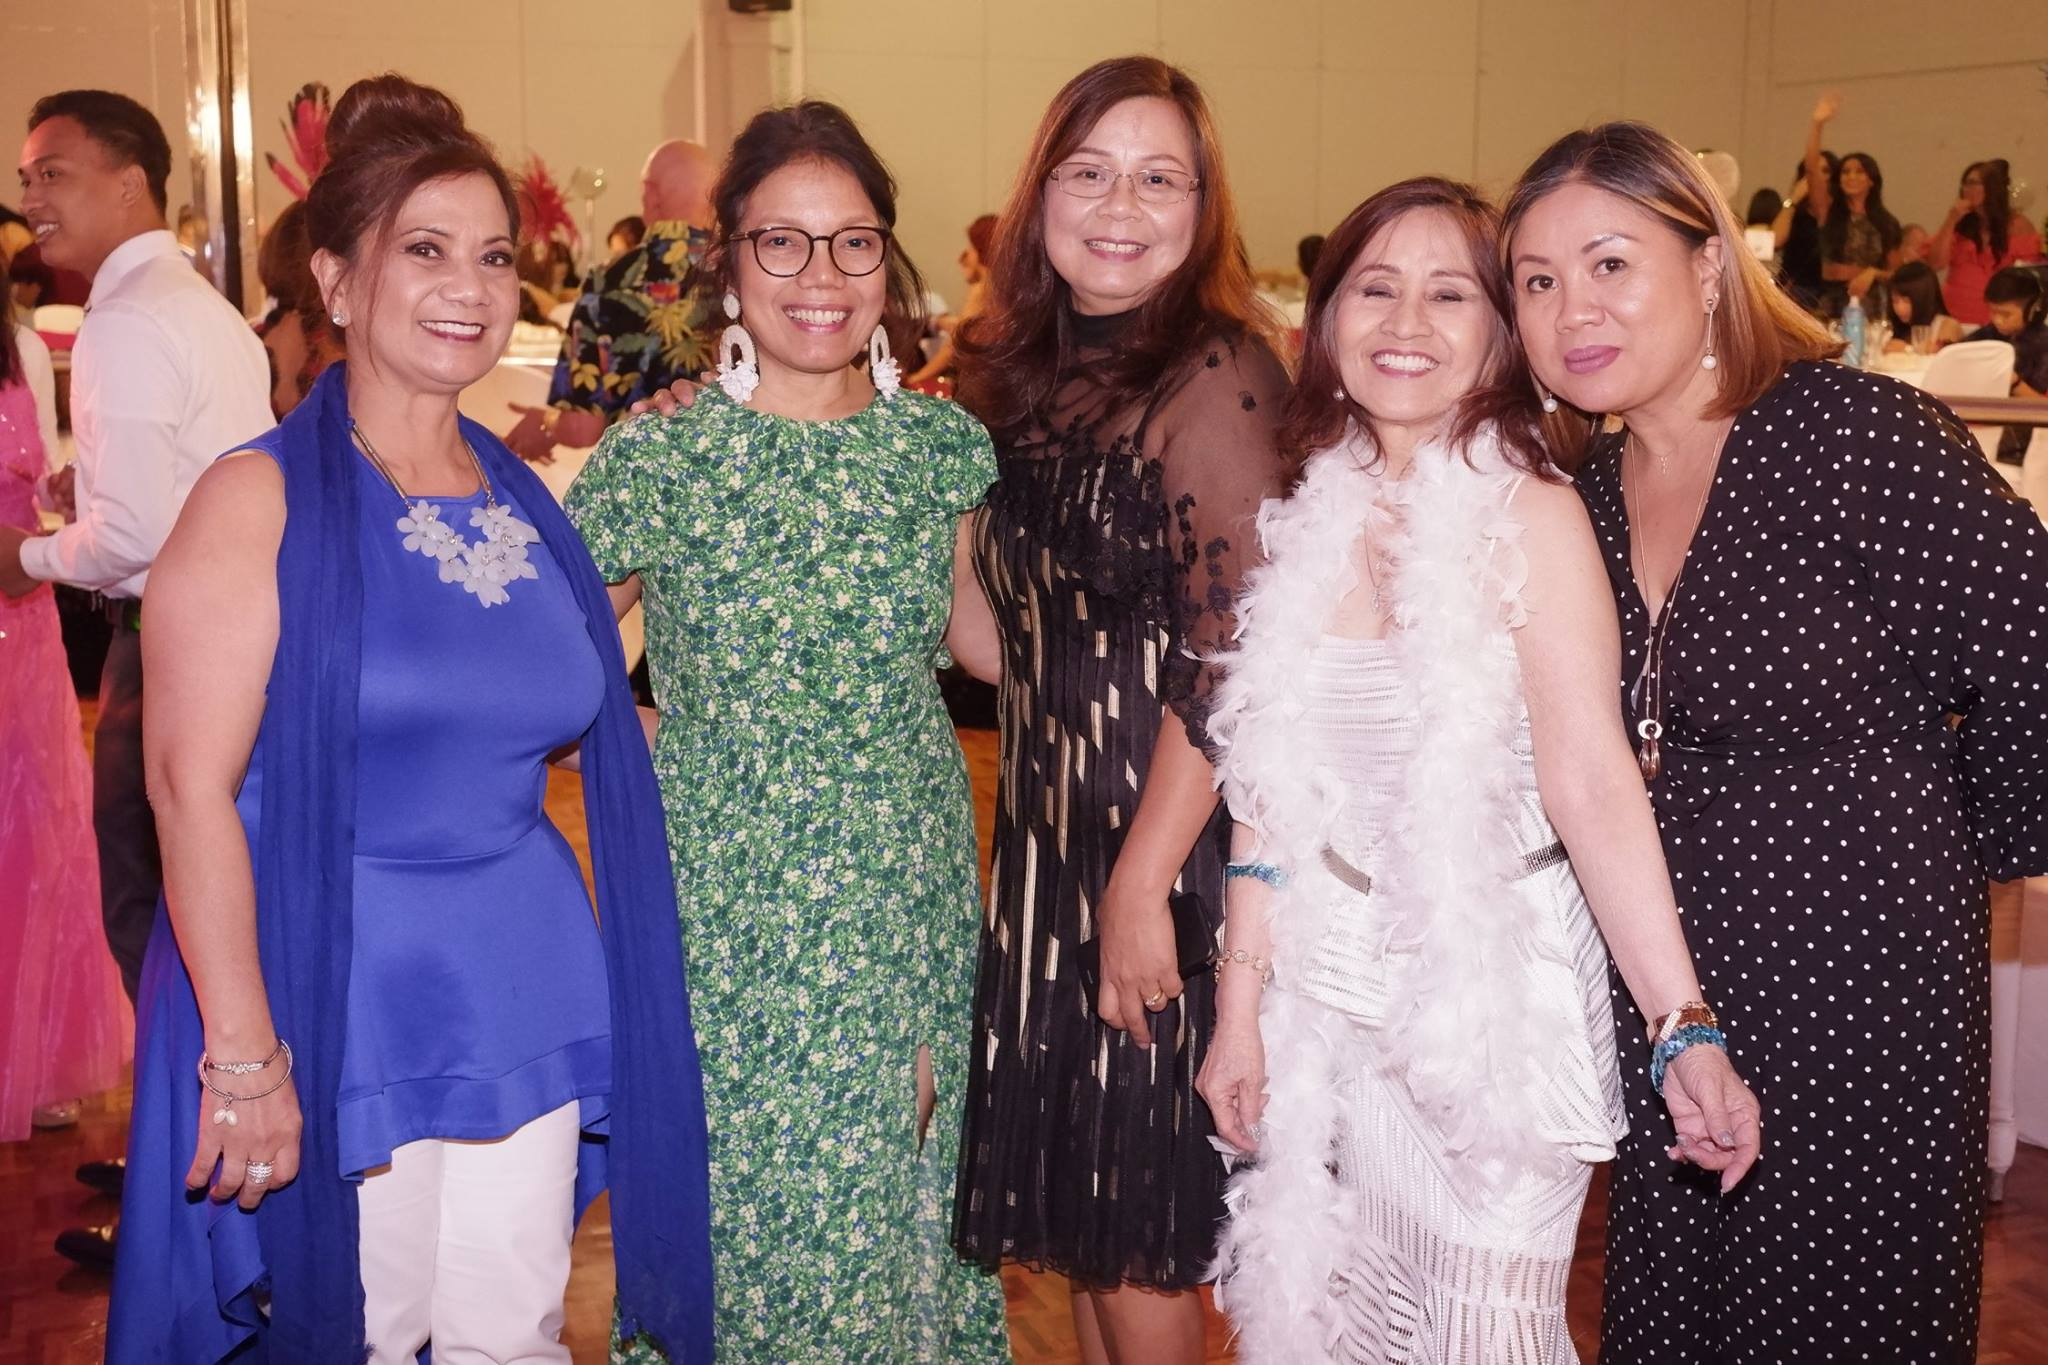 smad-rio-2019-nonprofit-melbourne-dinner-dance-melbourne-australia-chrity-ball.jpg